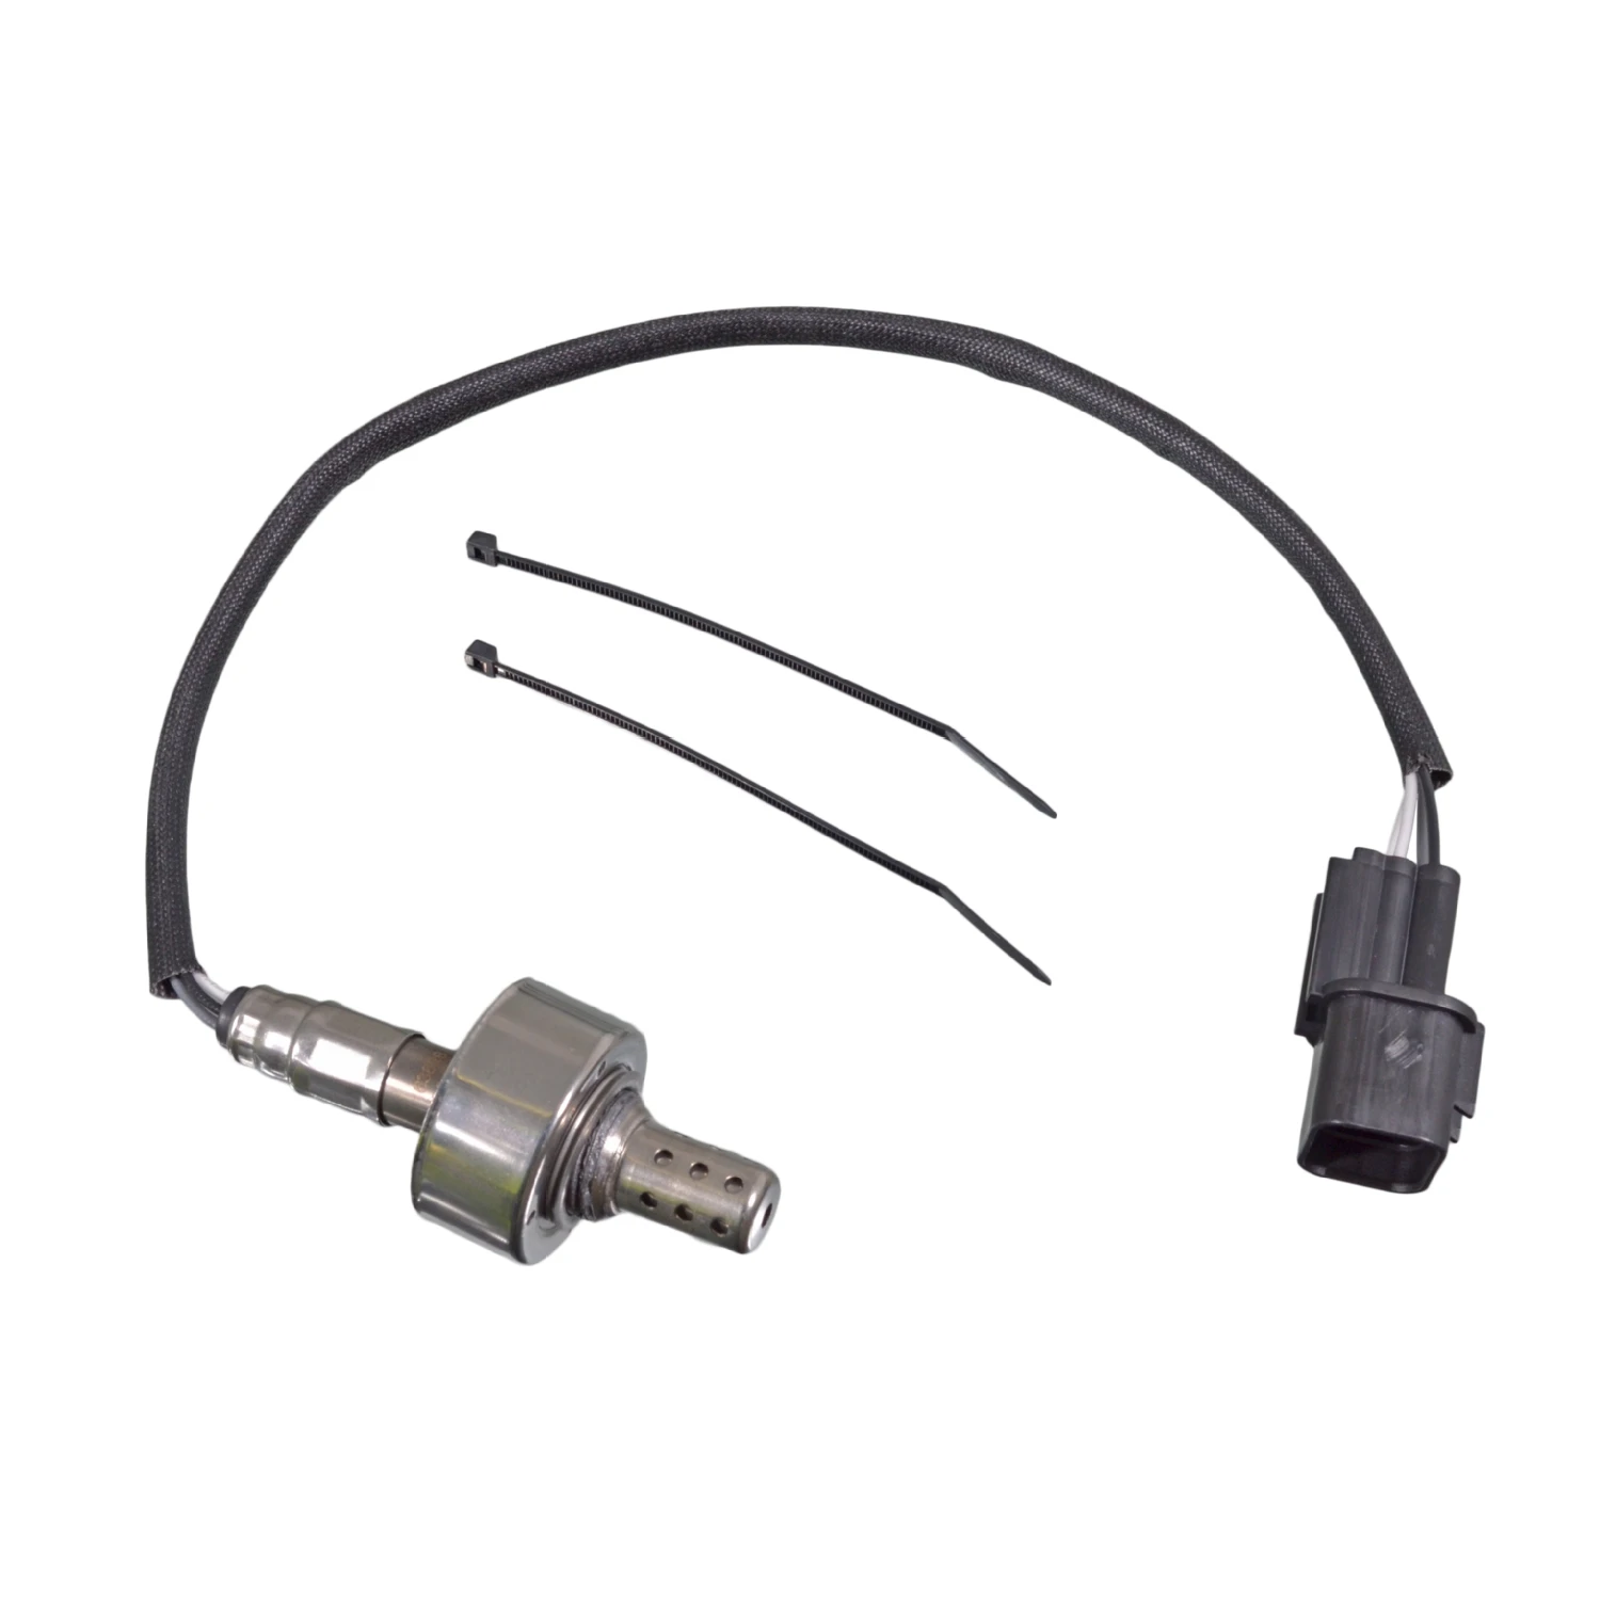 High quality Front Oxygen Sensor For Hyundai Kia OEM 39210-04000 3921004000